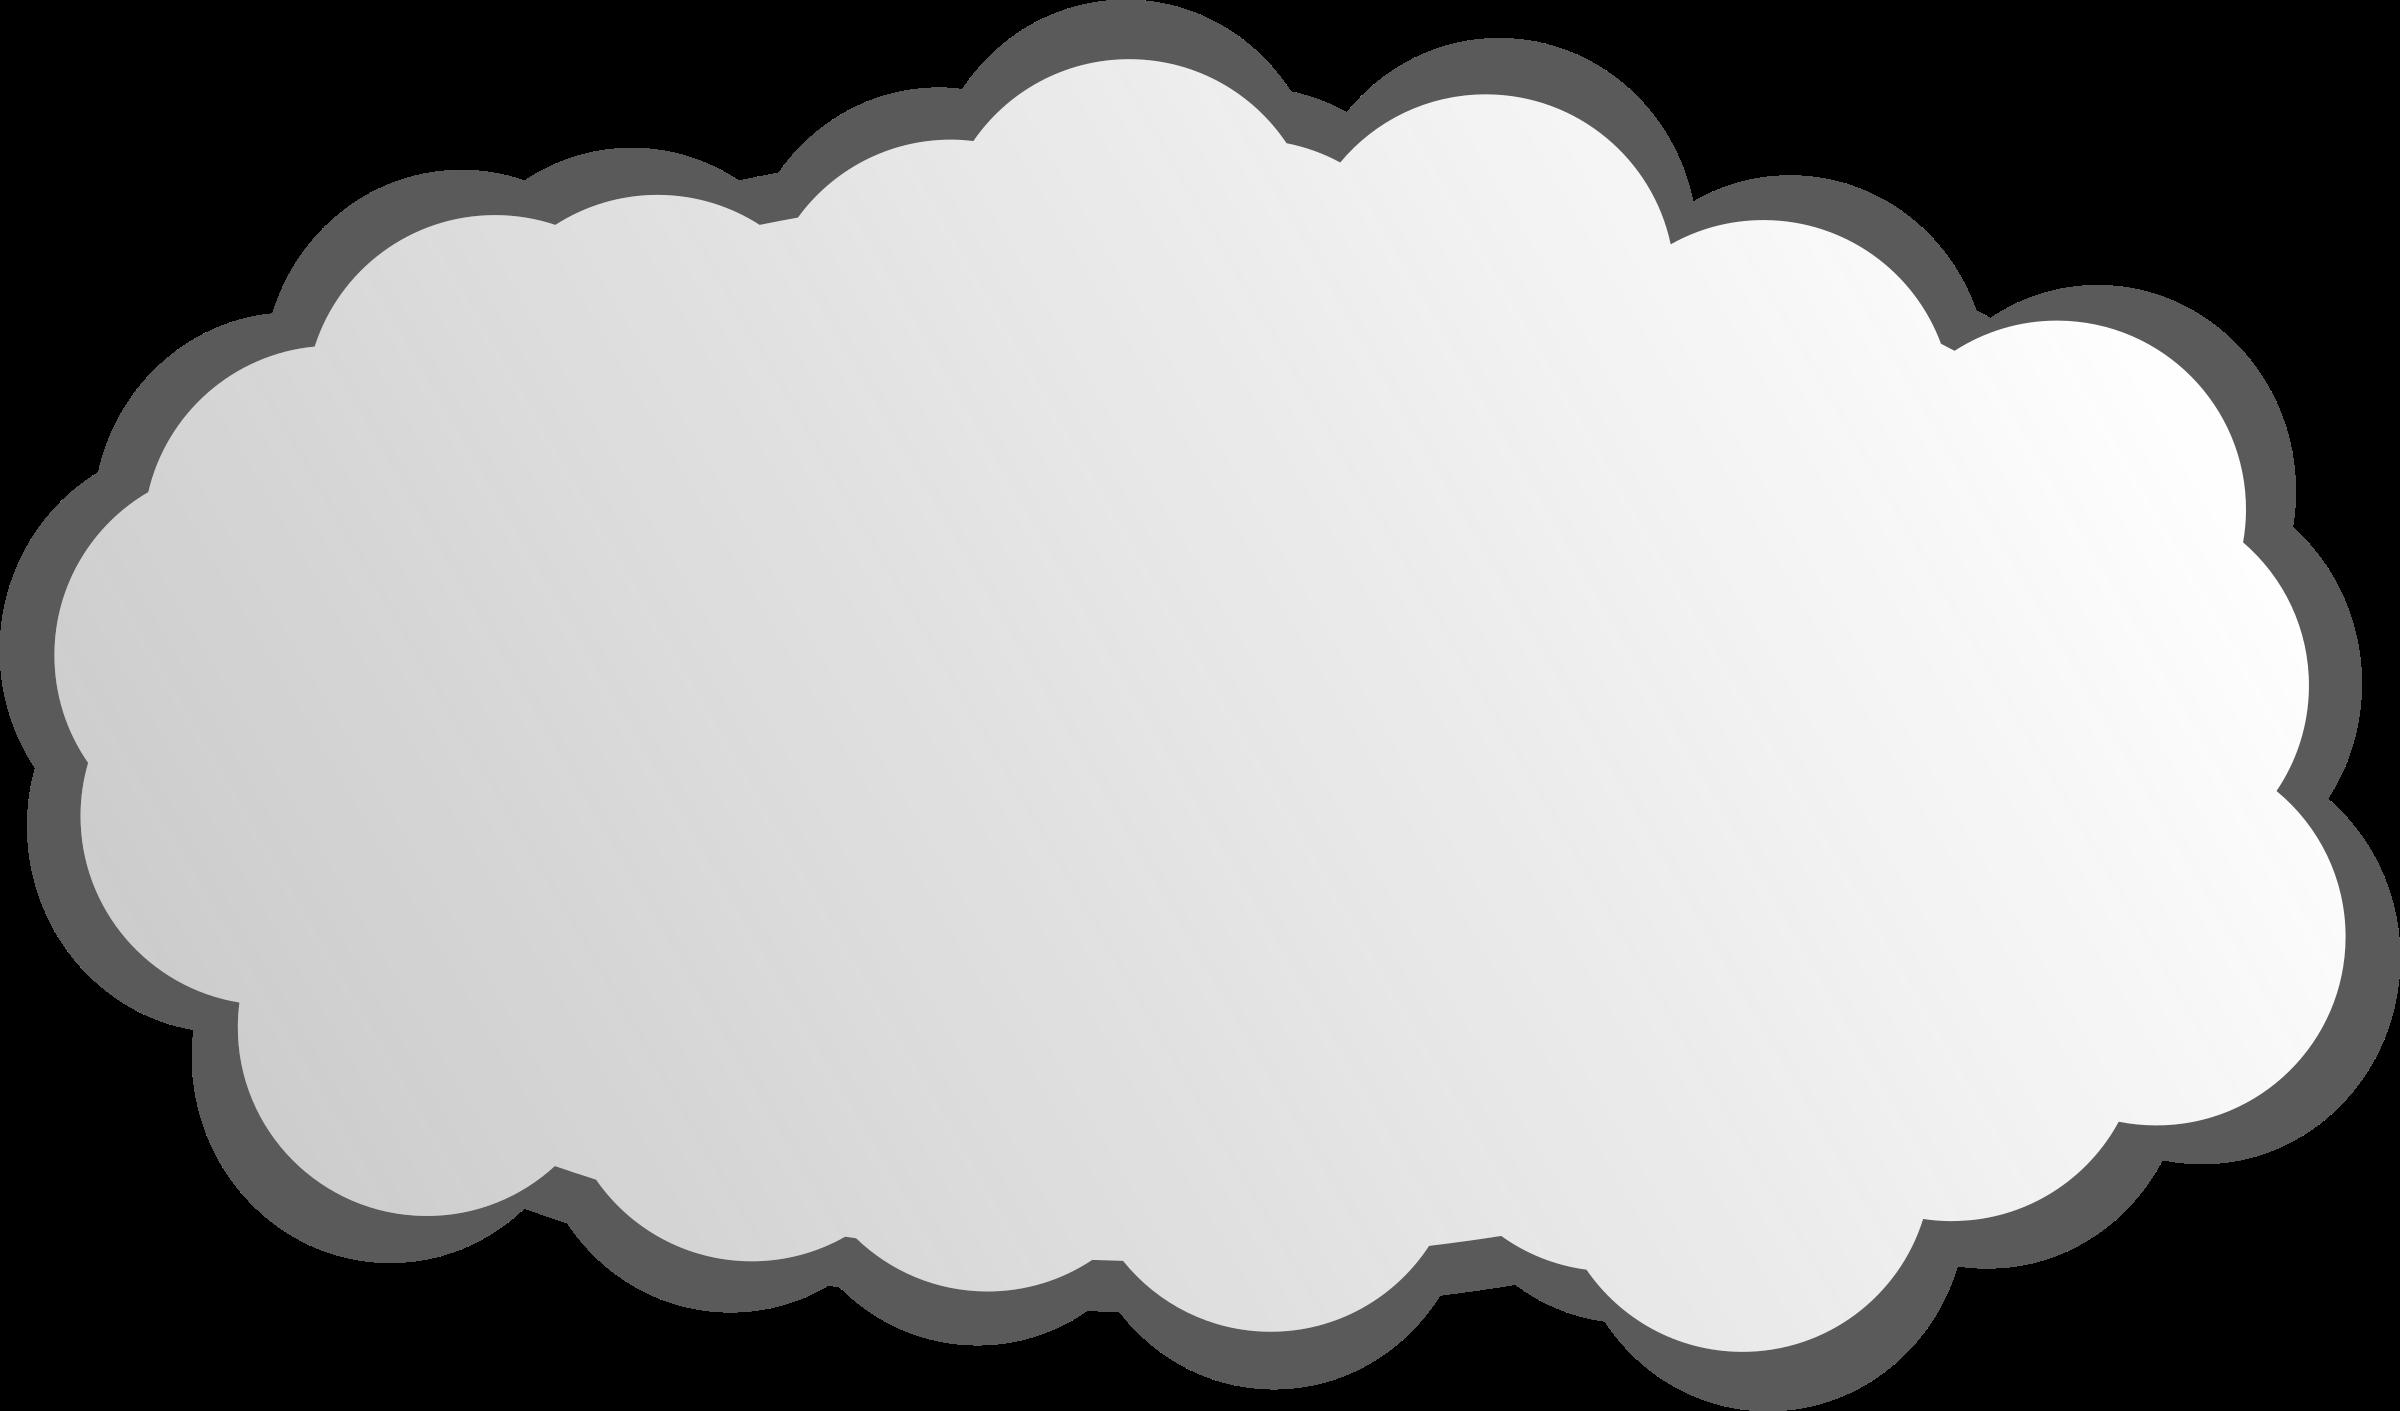 Cloud clipart simple. Big image png